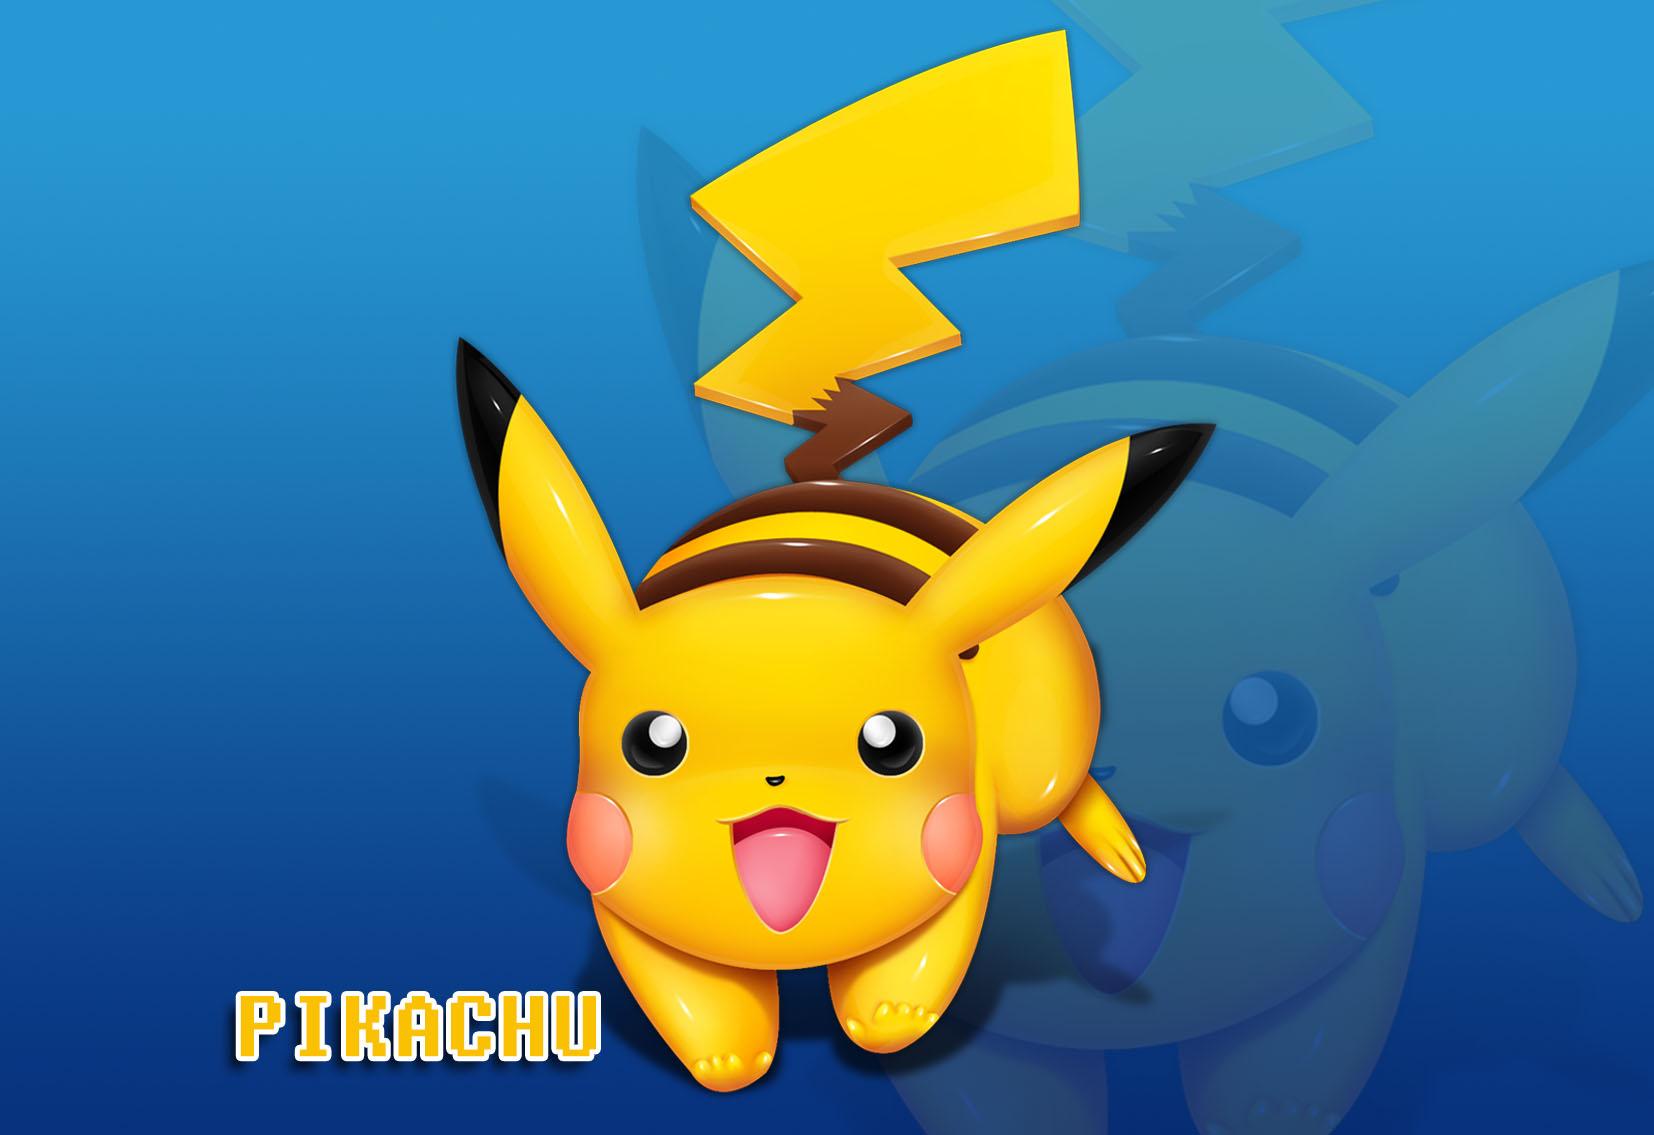 Pikachu 3D render